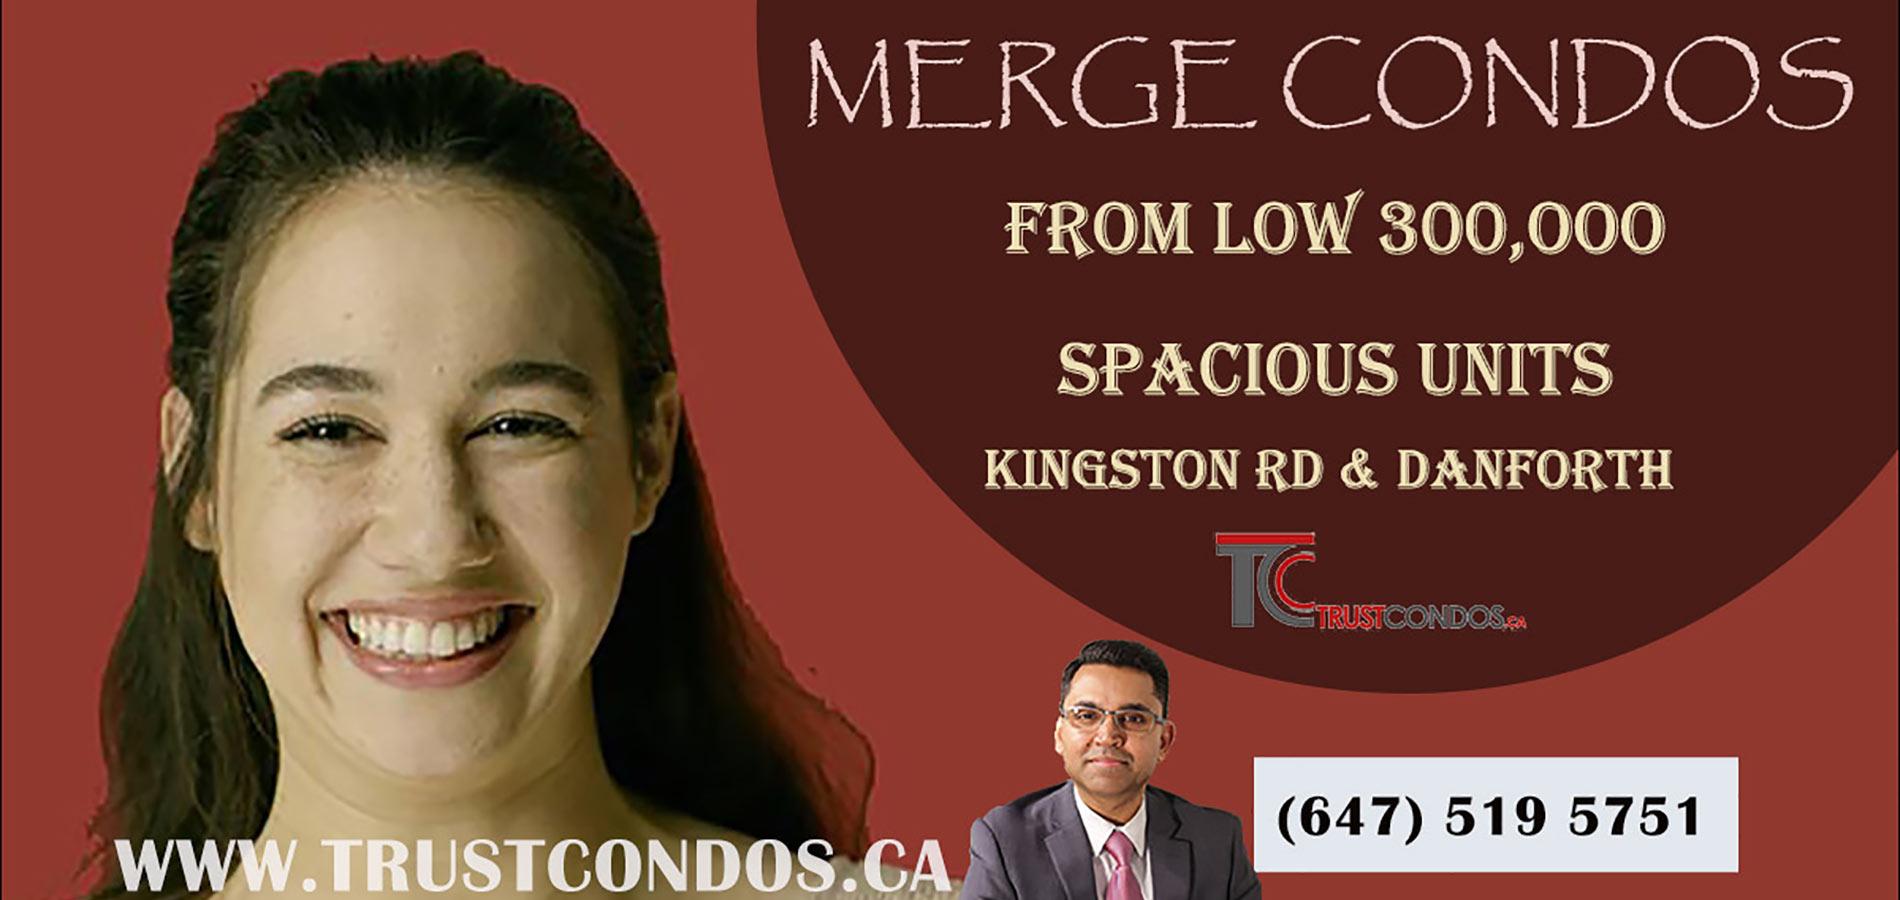 MERGE CONDOS KINGSTON ROAD